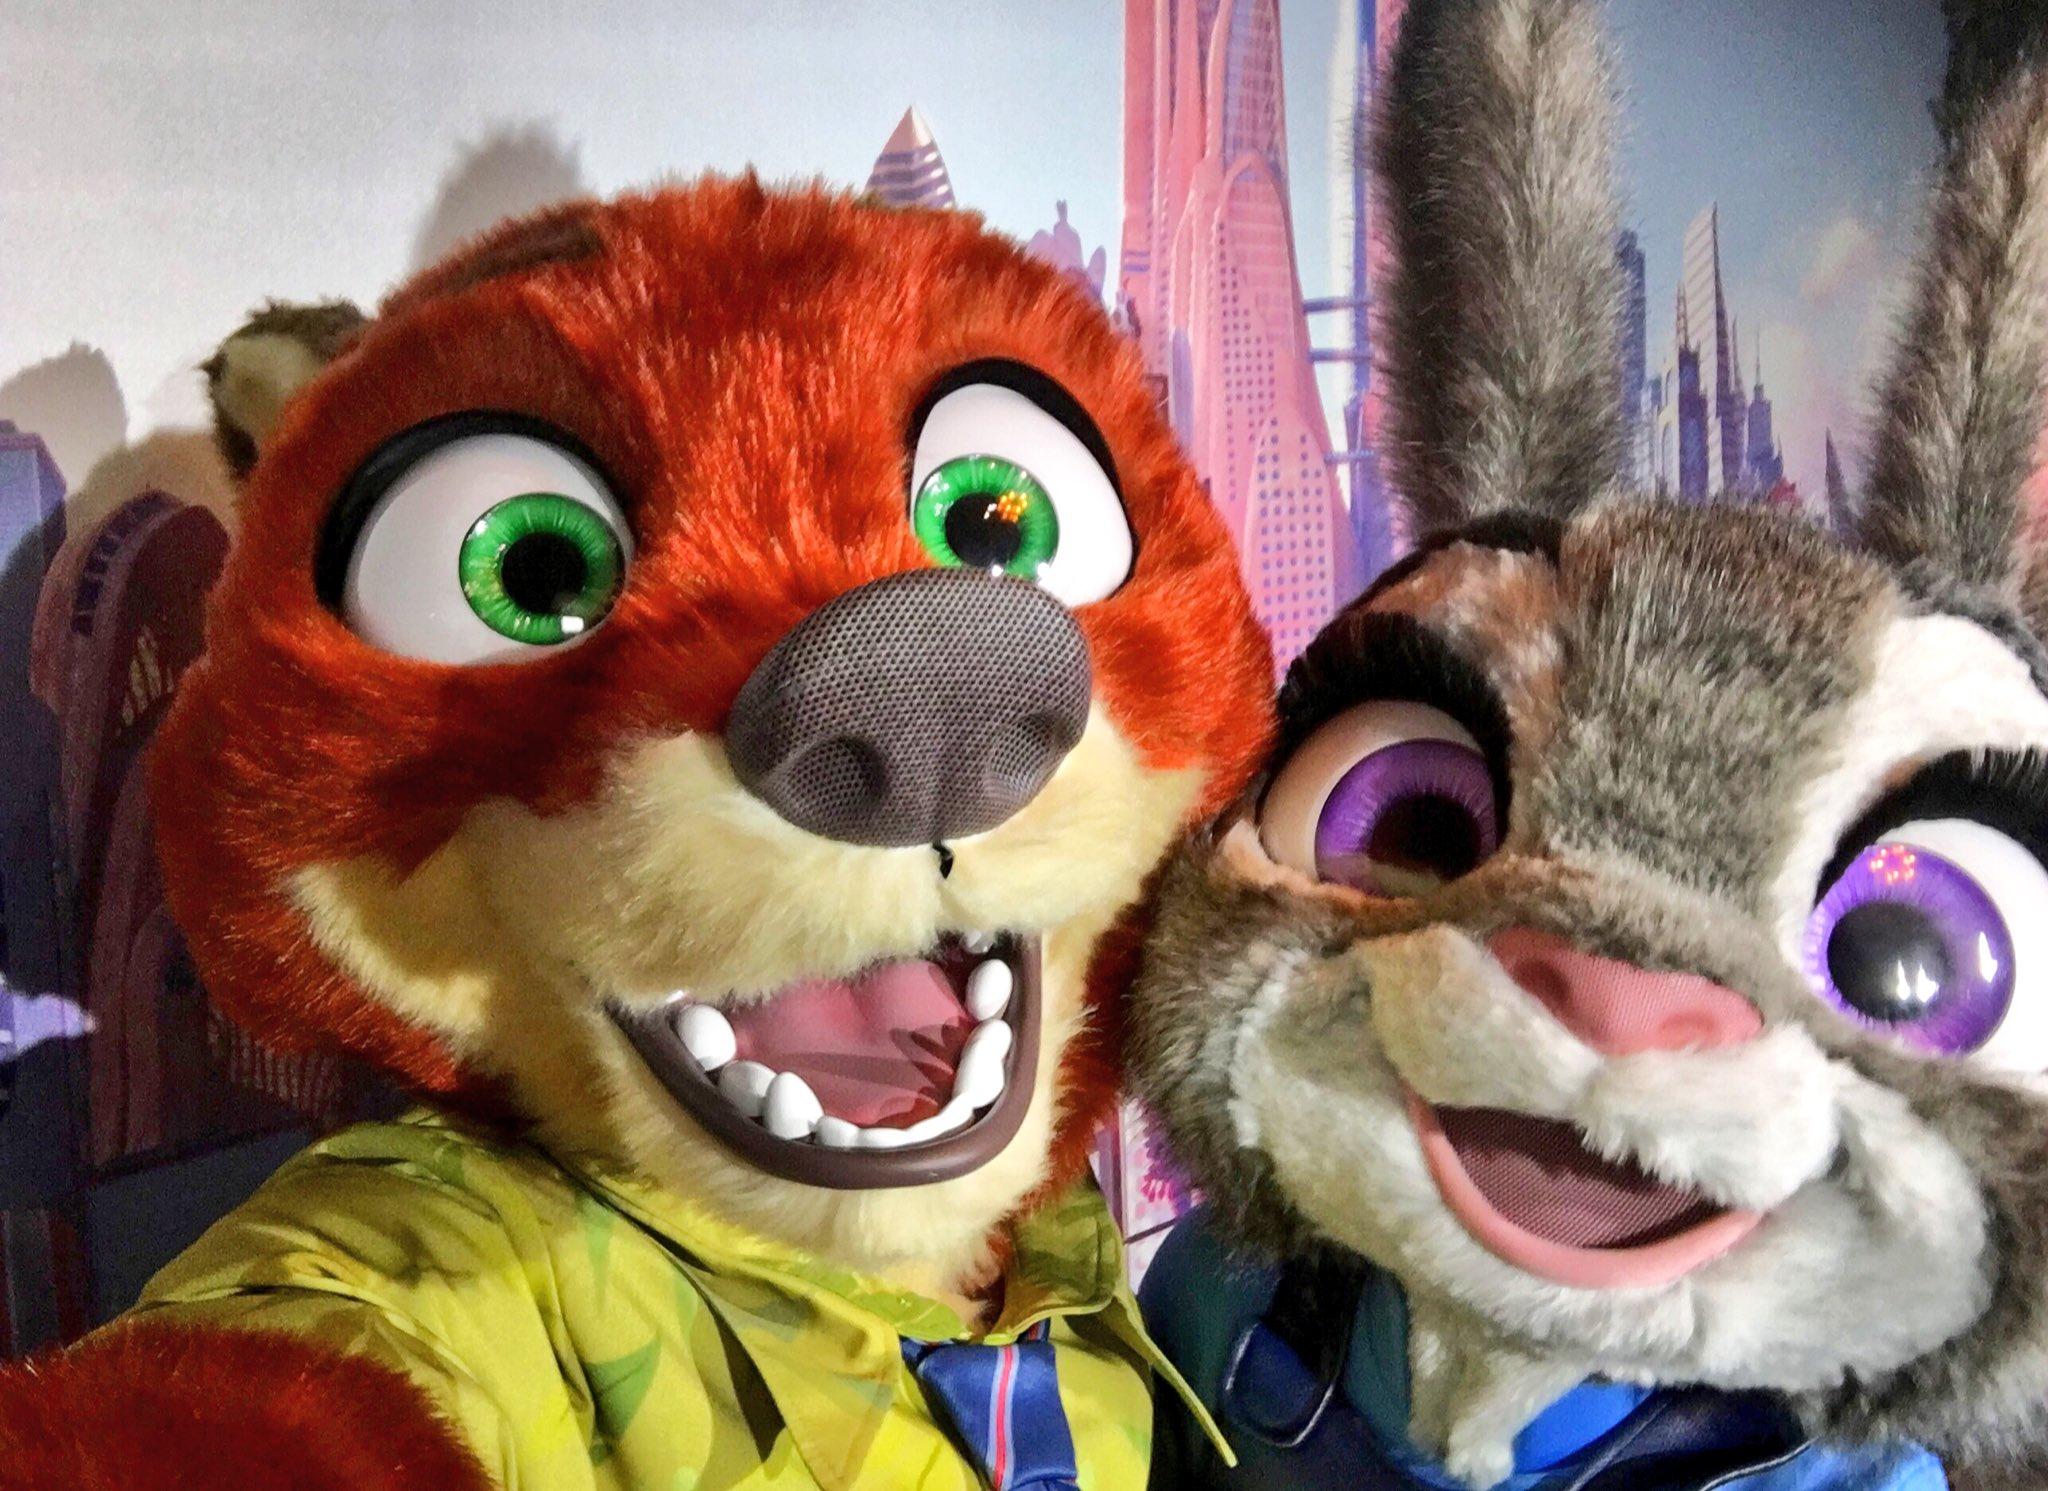 💚📸 Nick and Judy Selfie 📸💚 #DisneylandParis #Zootopia https://t.co/ANxwwM2AQD